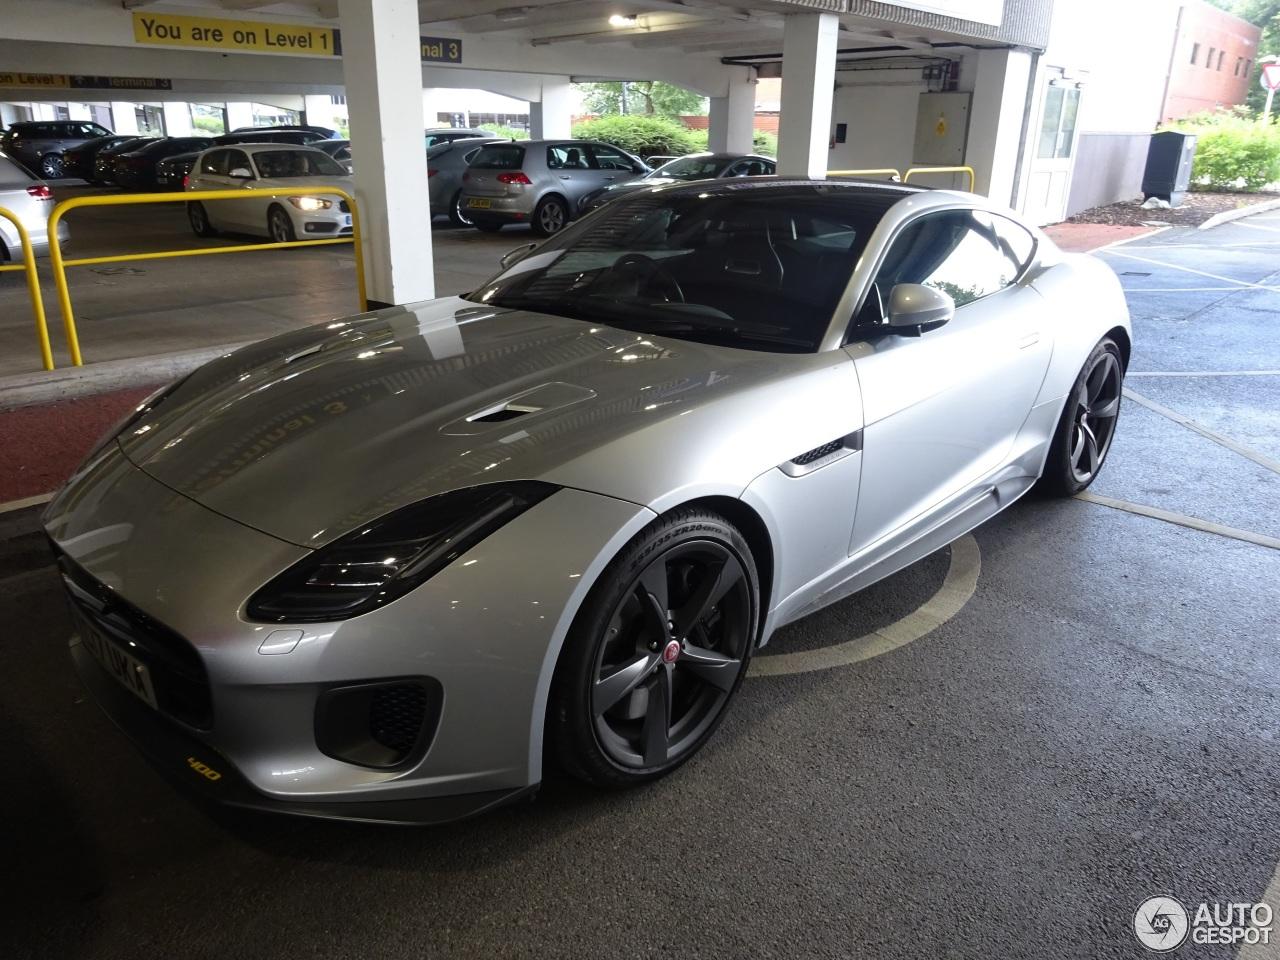 jaguar f type 400 sport awd coup 10 august 2017 autogespot. Black Bedroom Furniture Sets. Home Design Ideas